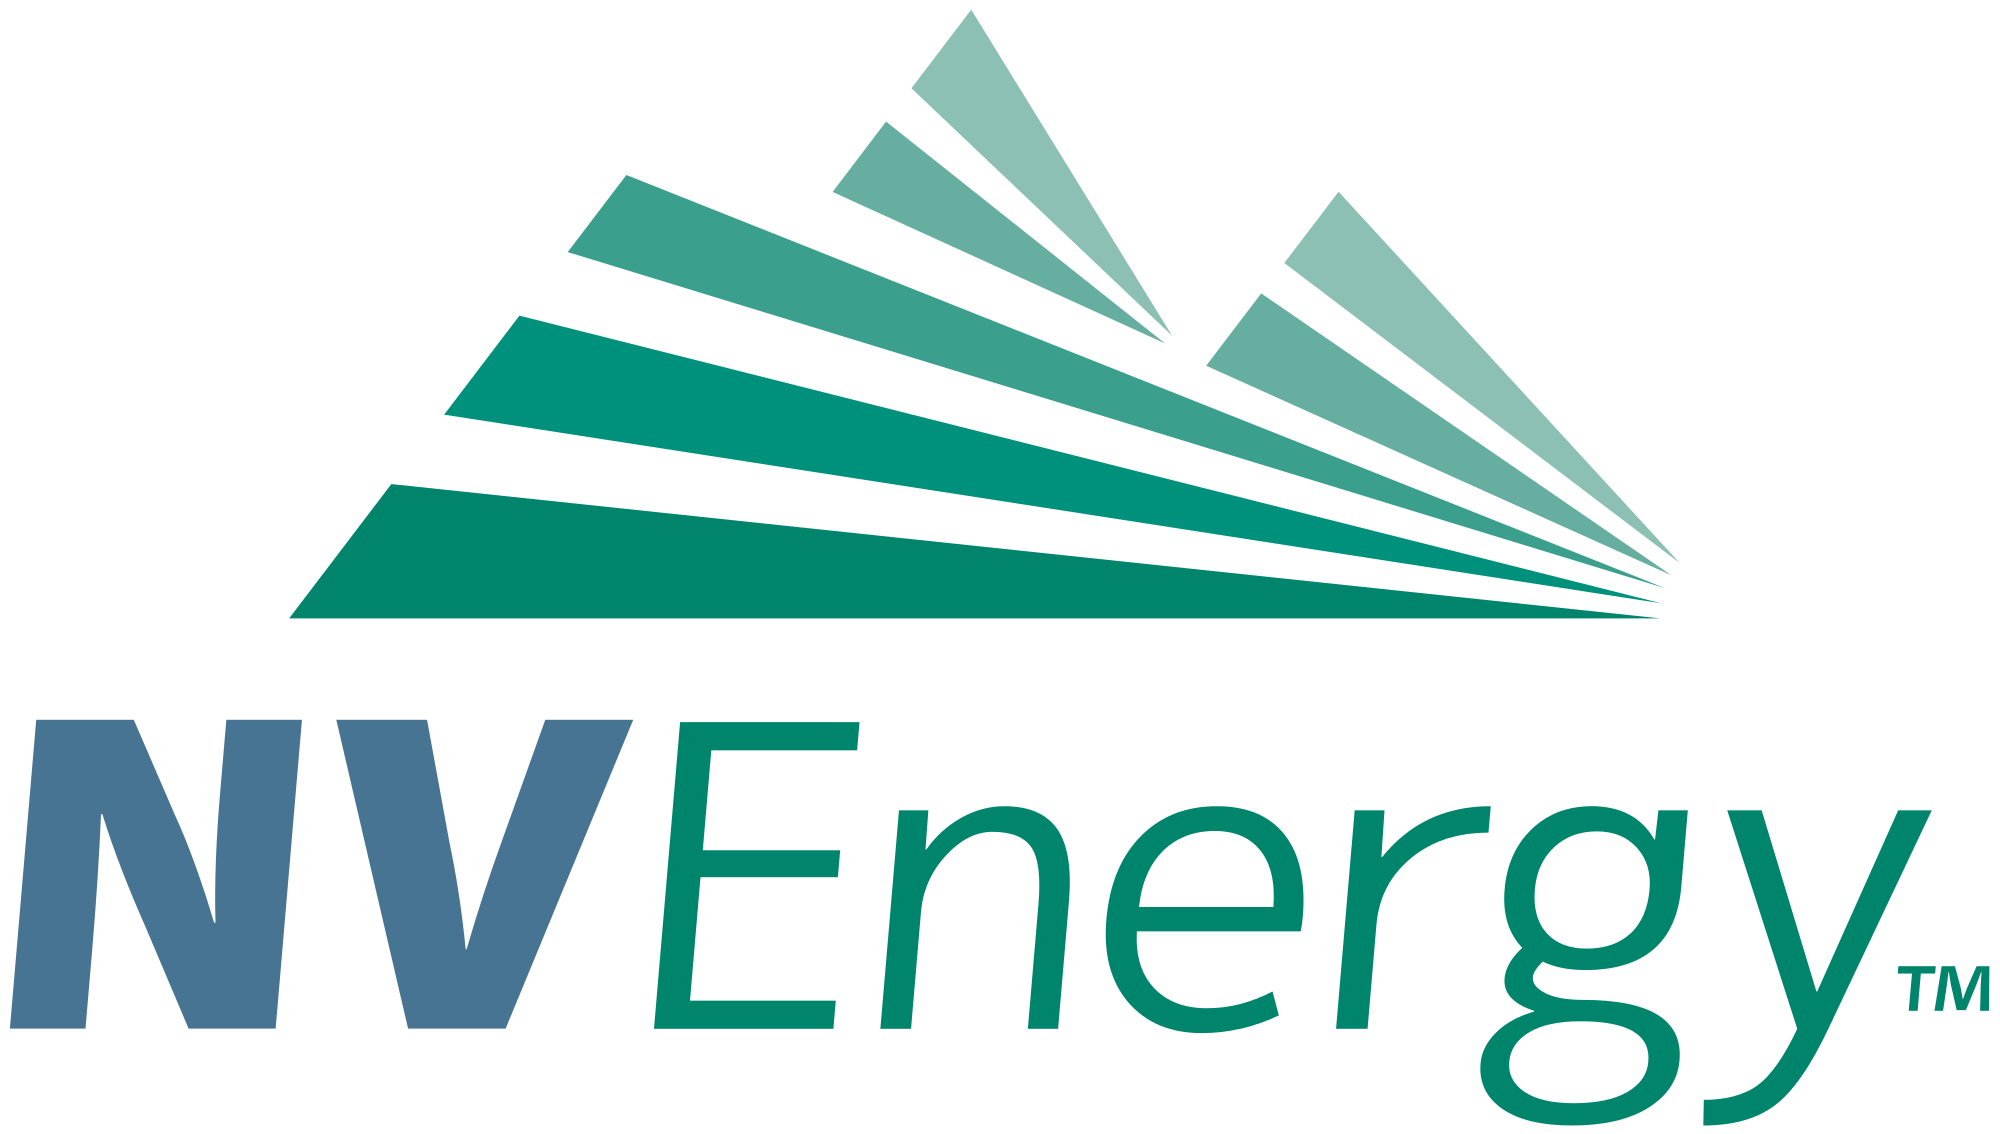 NV_Energy_Logo.svg